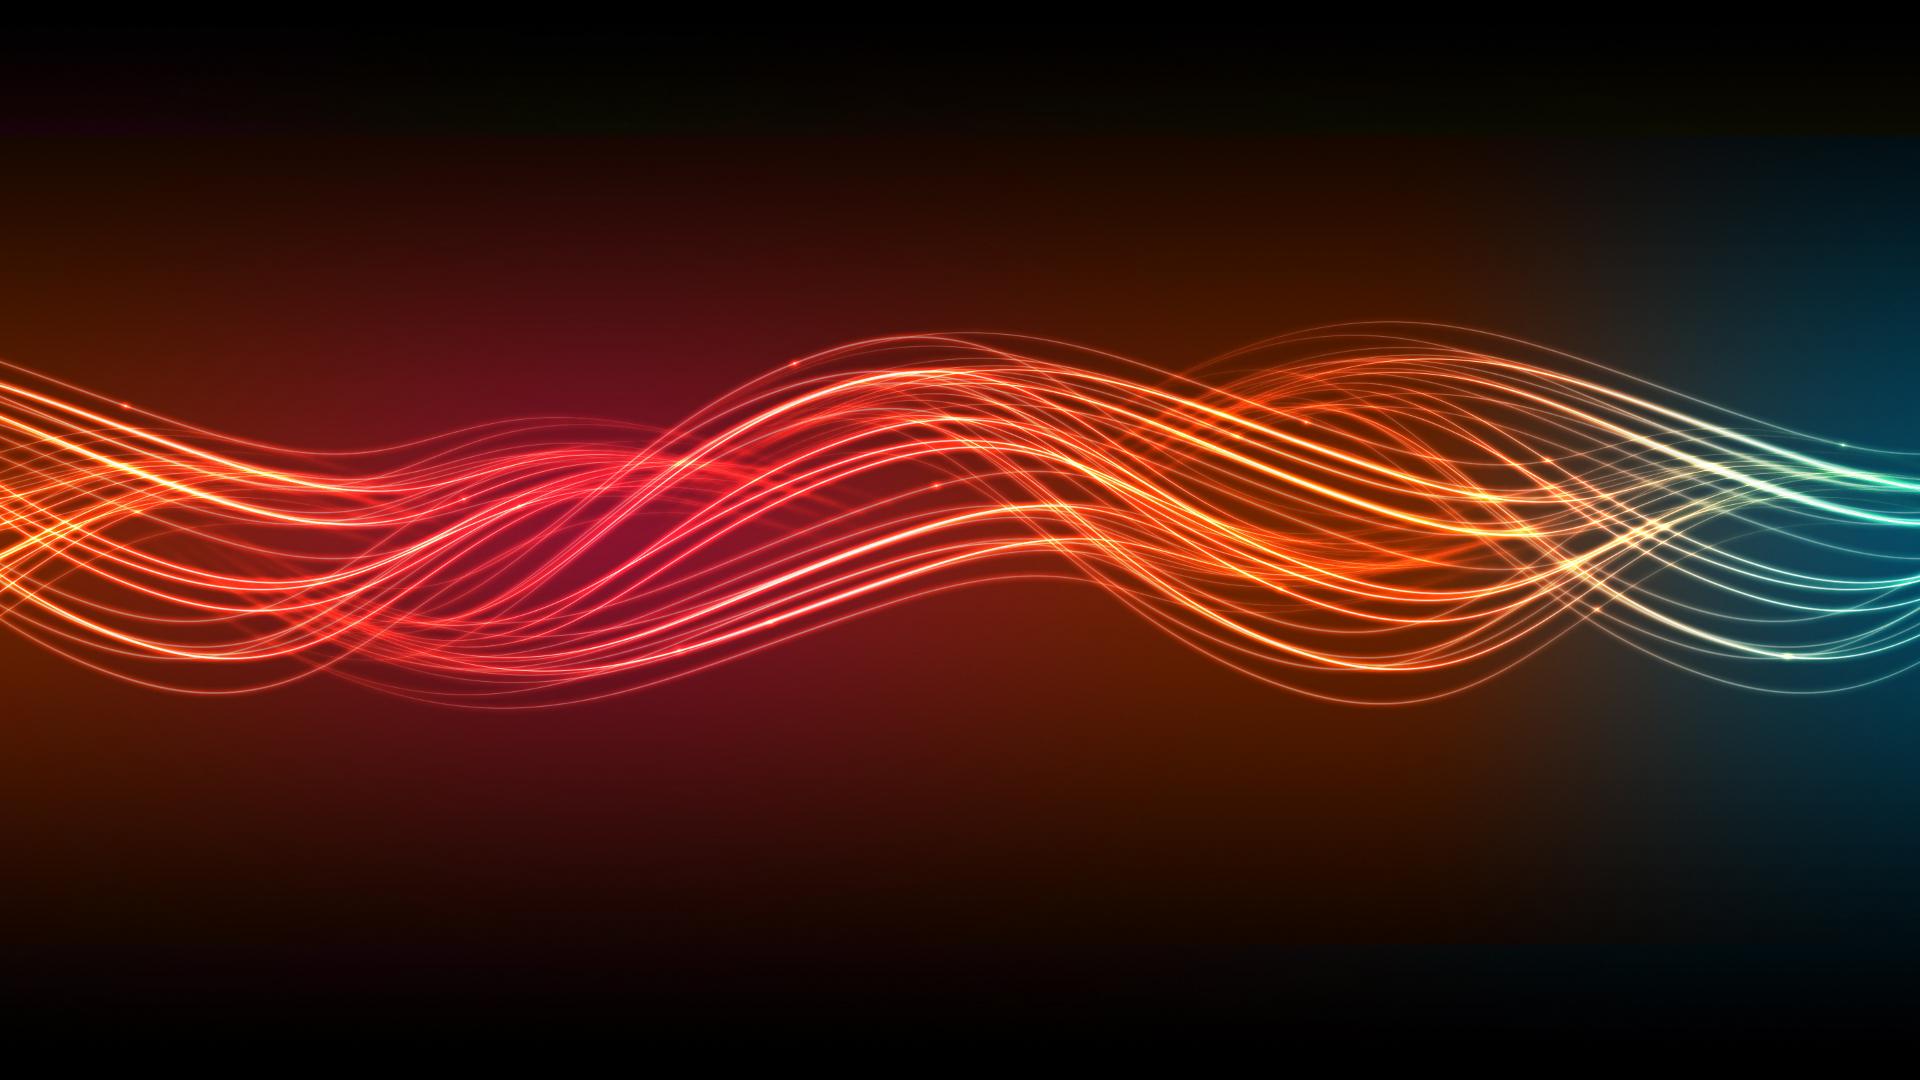 red neon wallpaper - photo #27